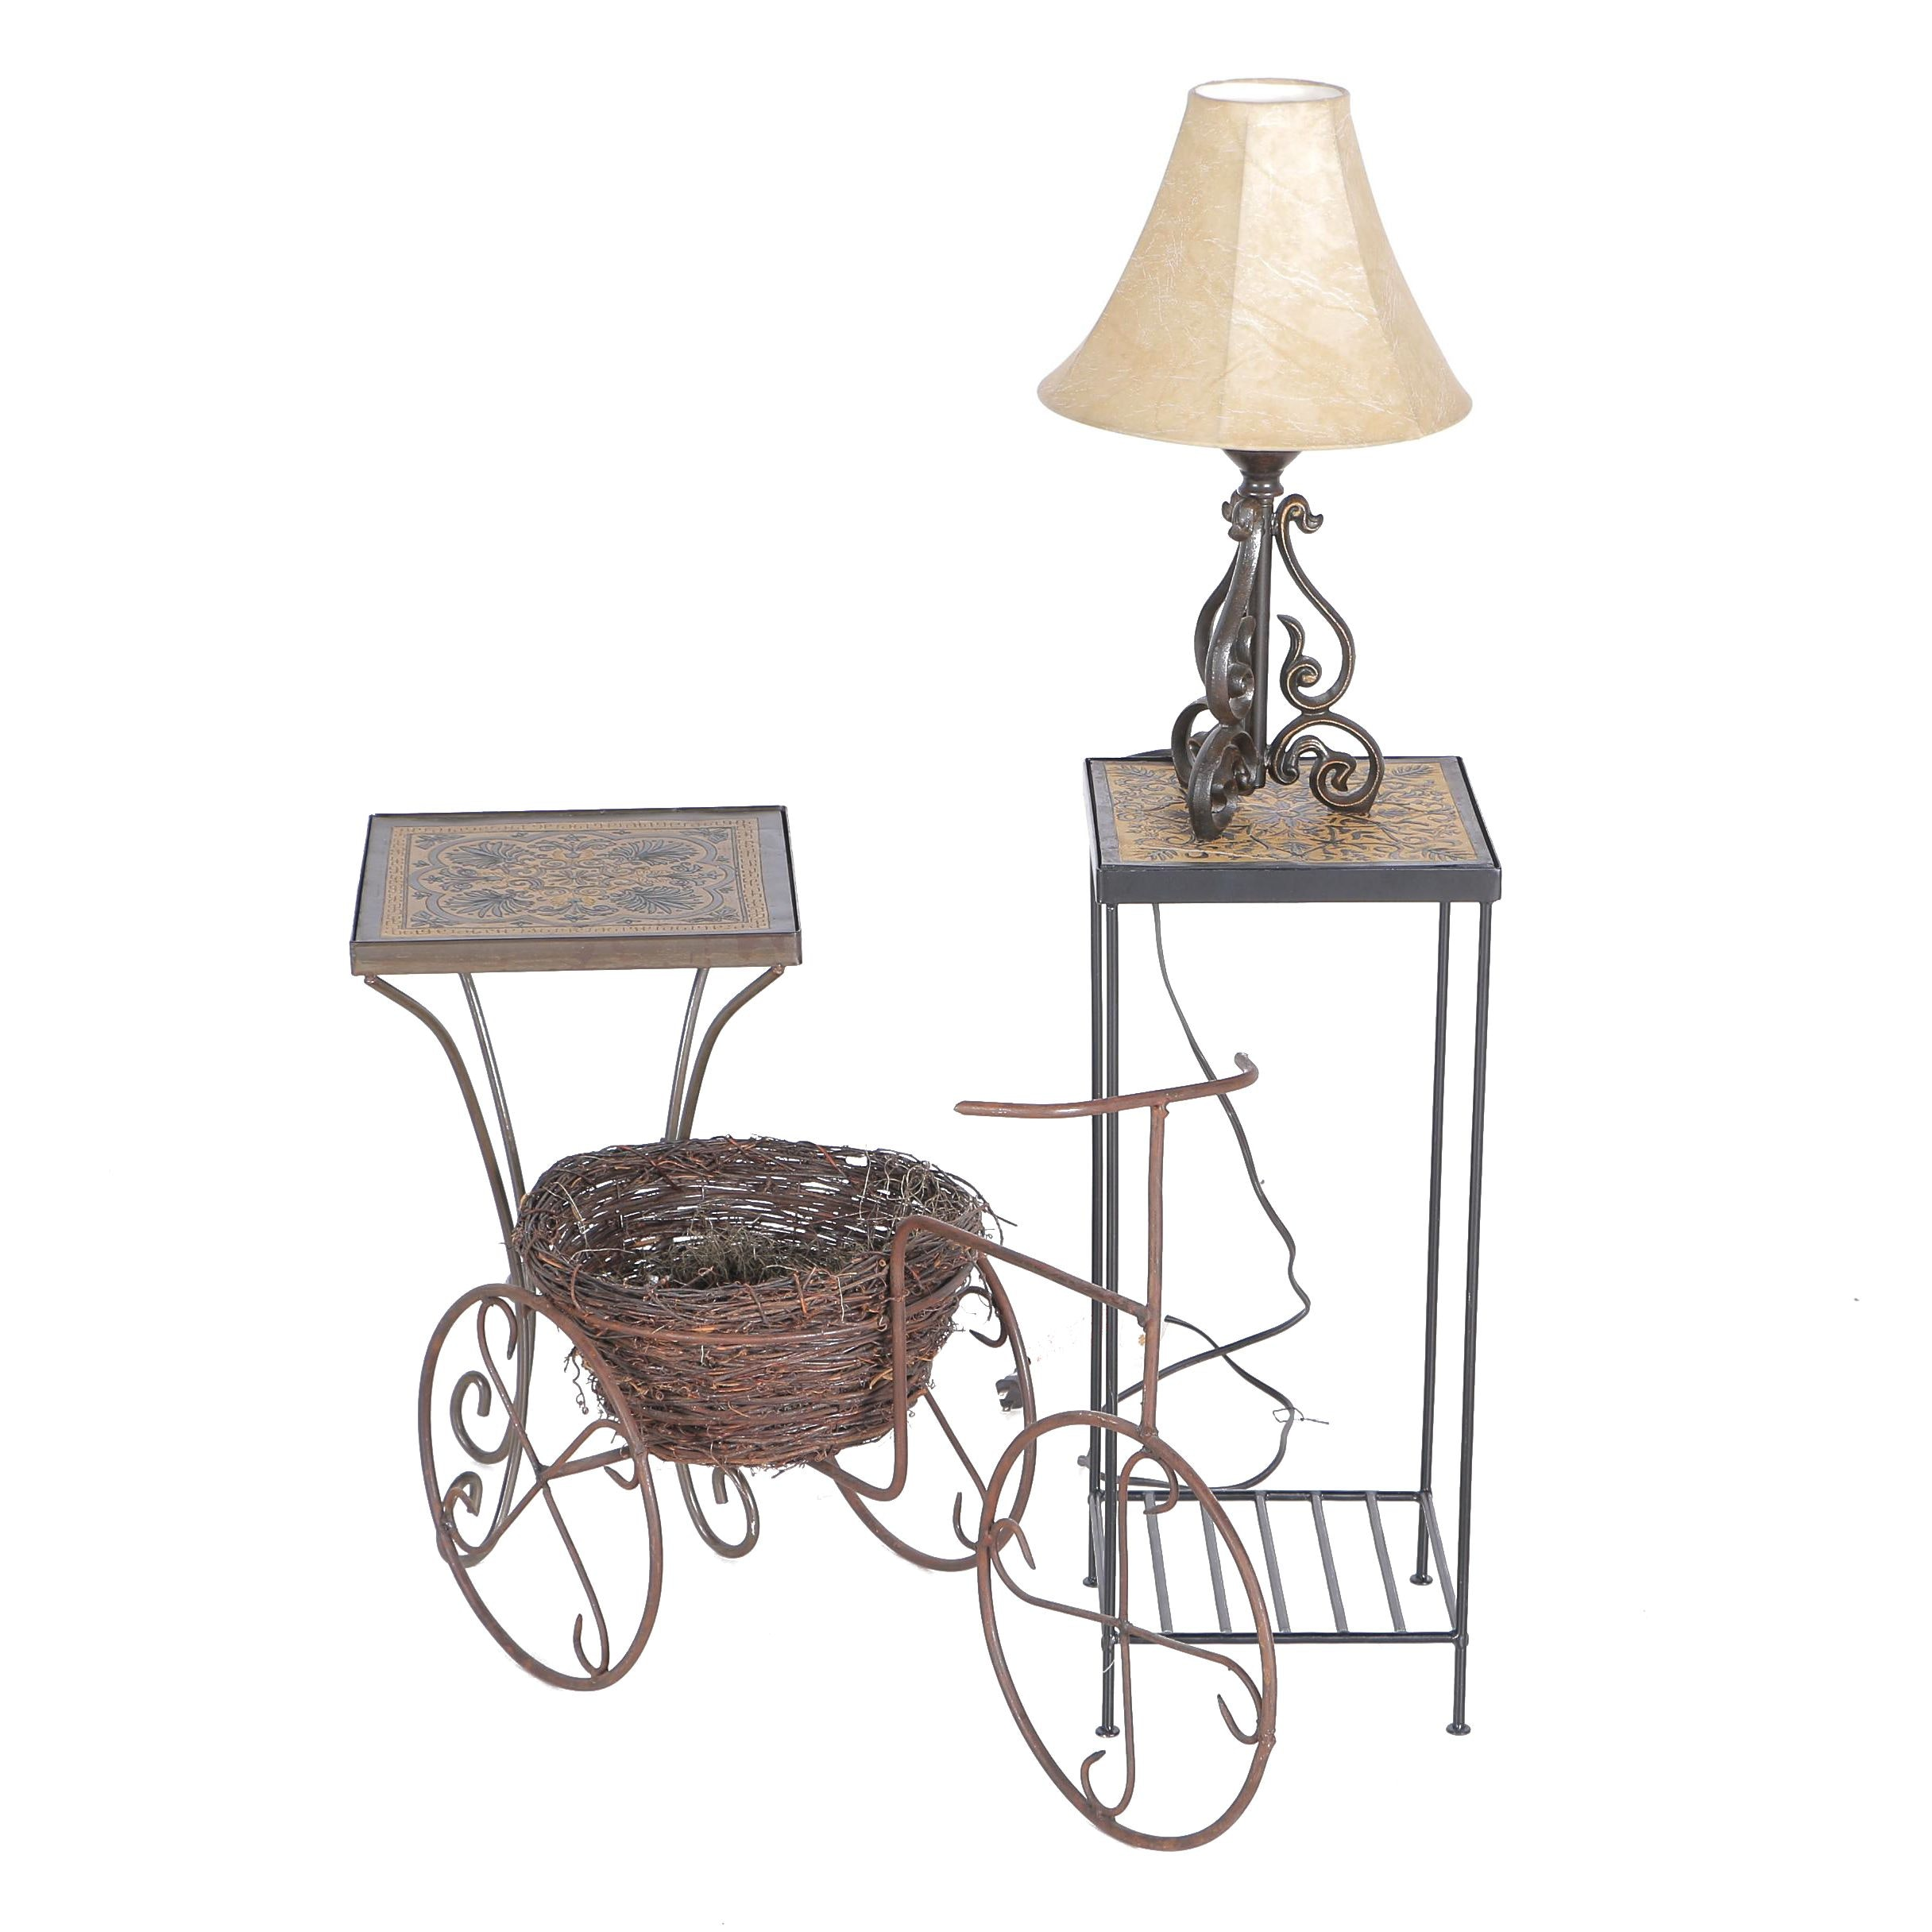 Wrought Iron Tables, Lamp and Garden Decor